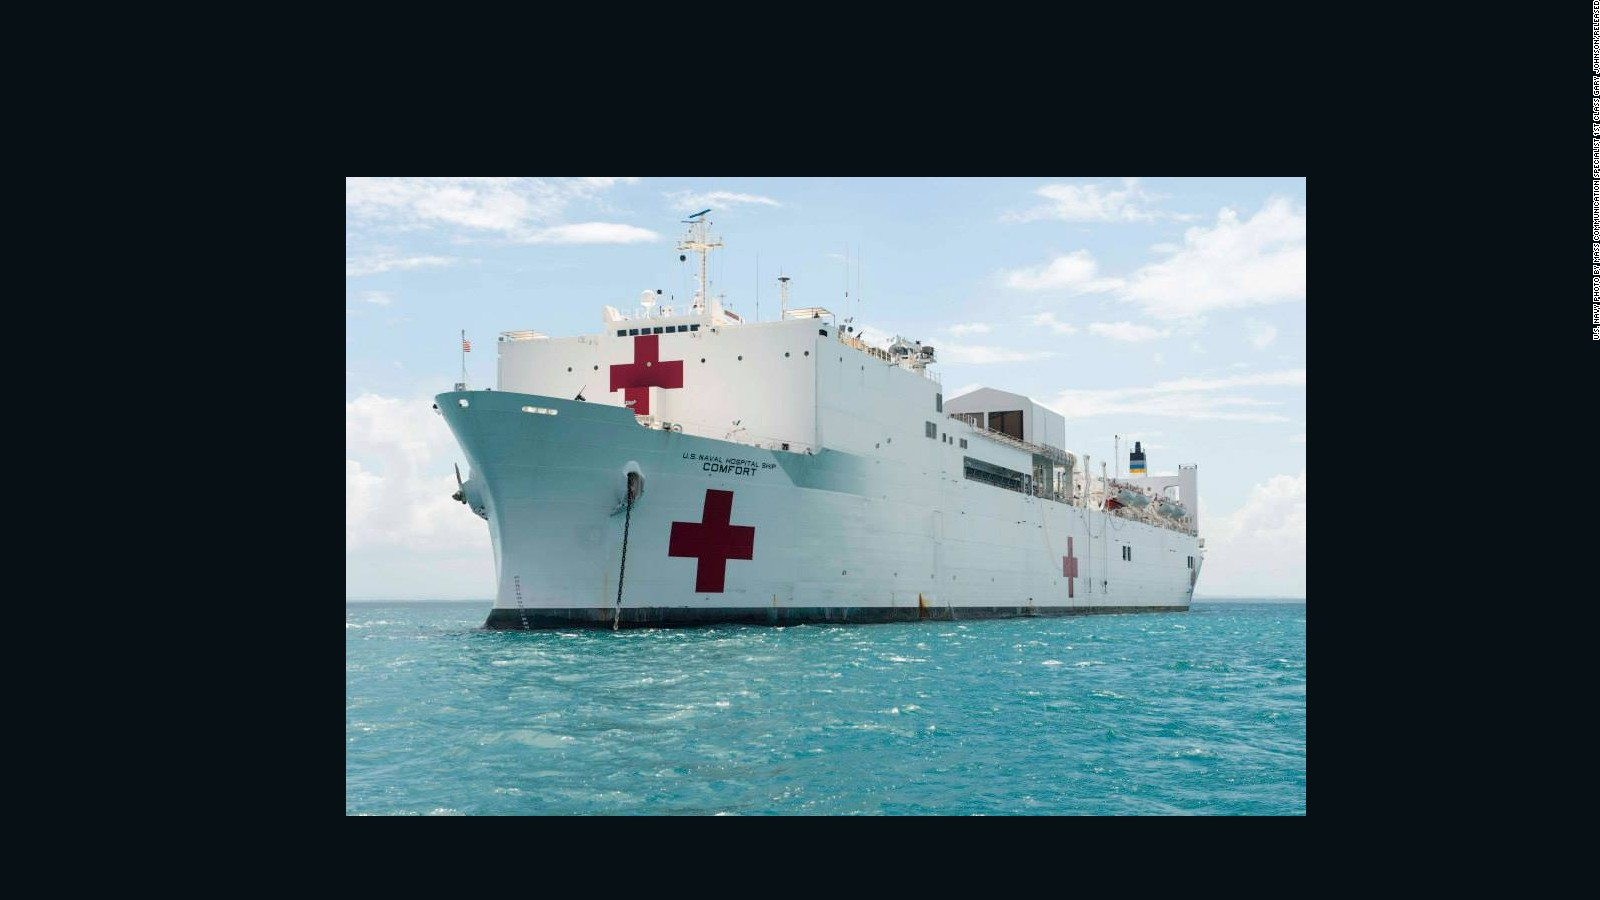 Us Military Sends Ships Aircraft To Puerto Rico Cnnpolitics